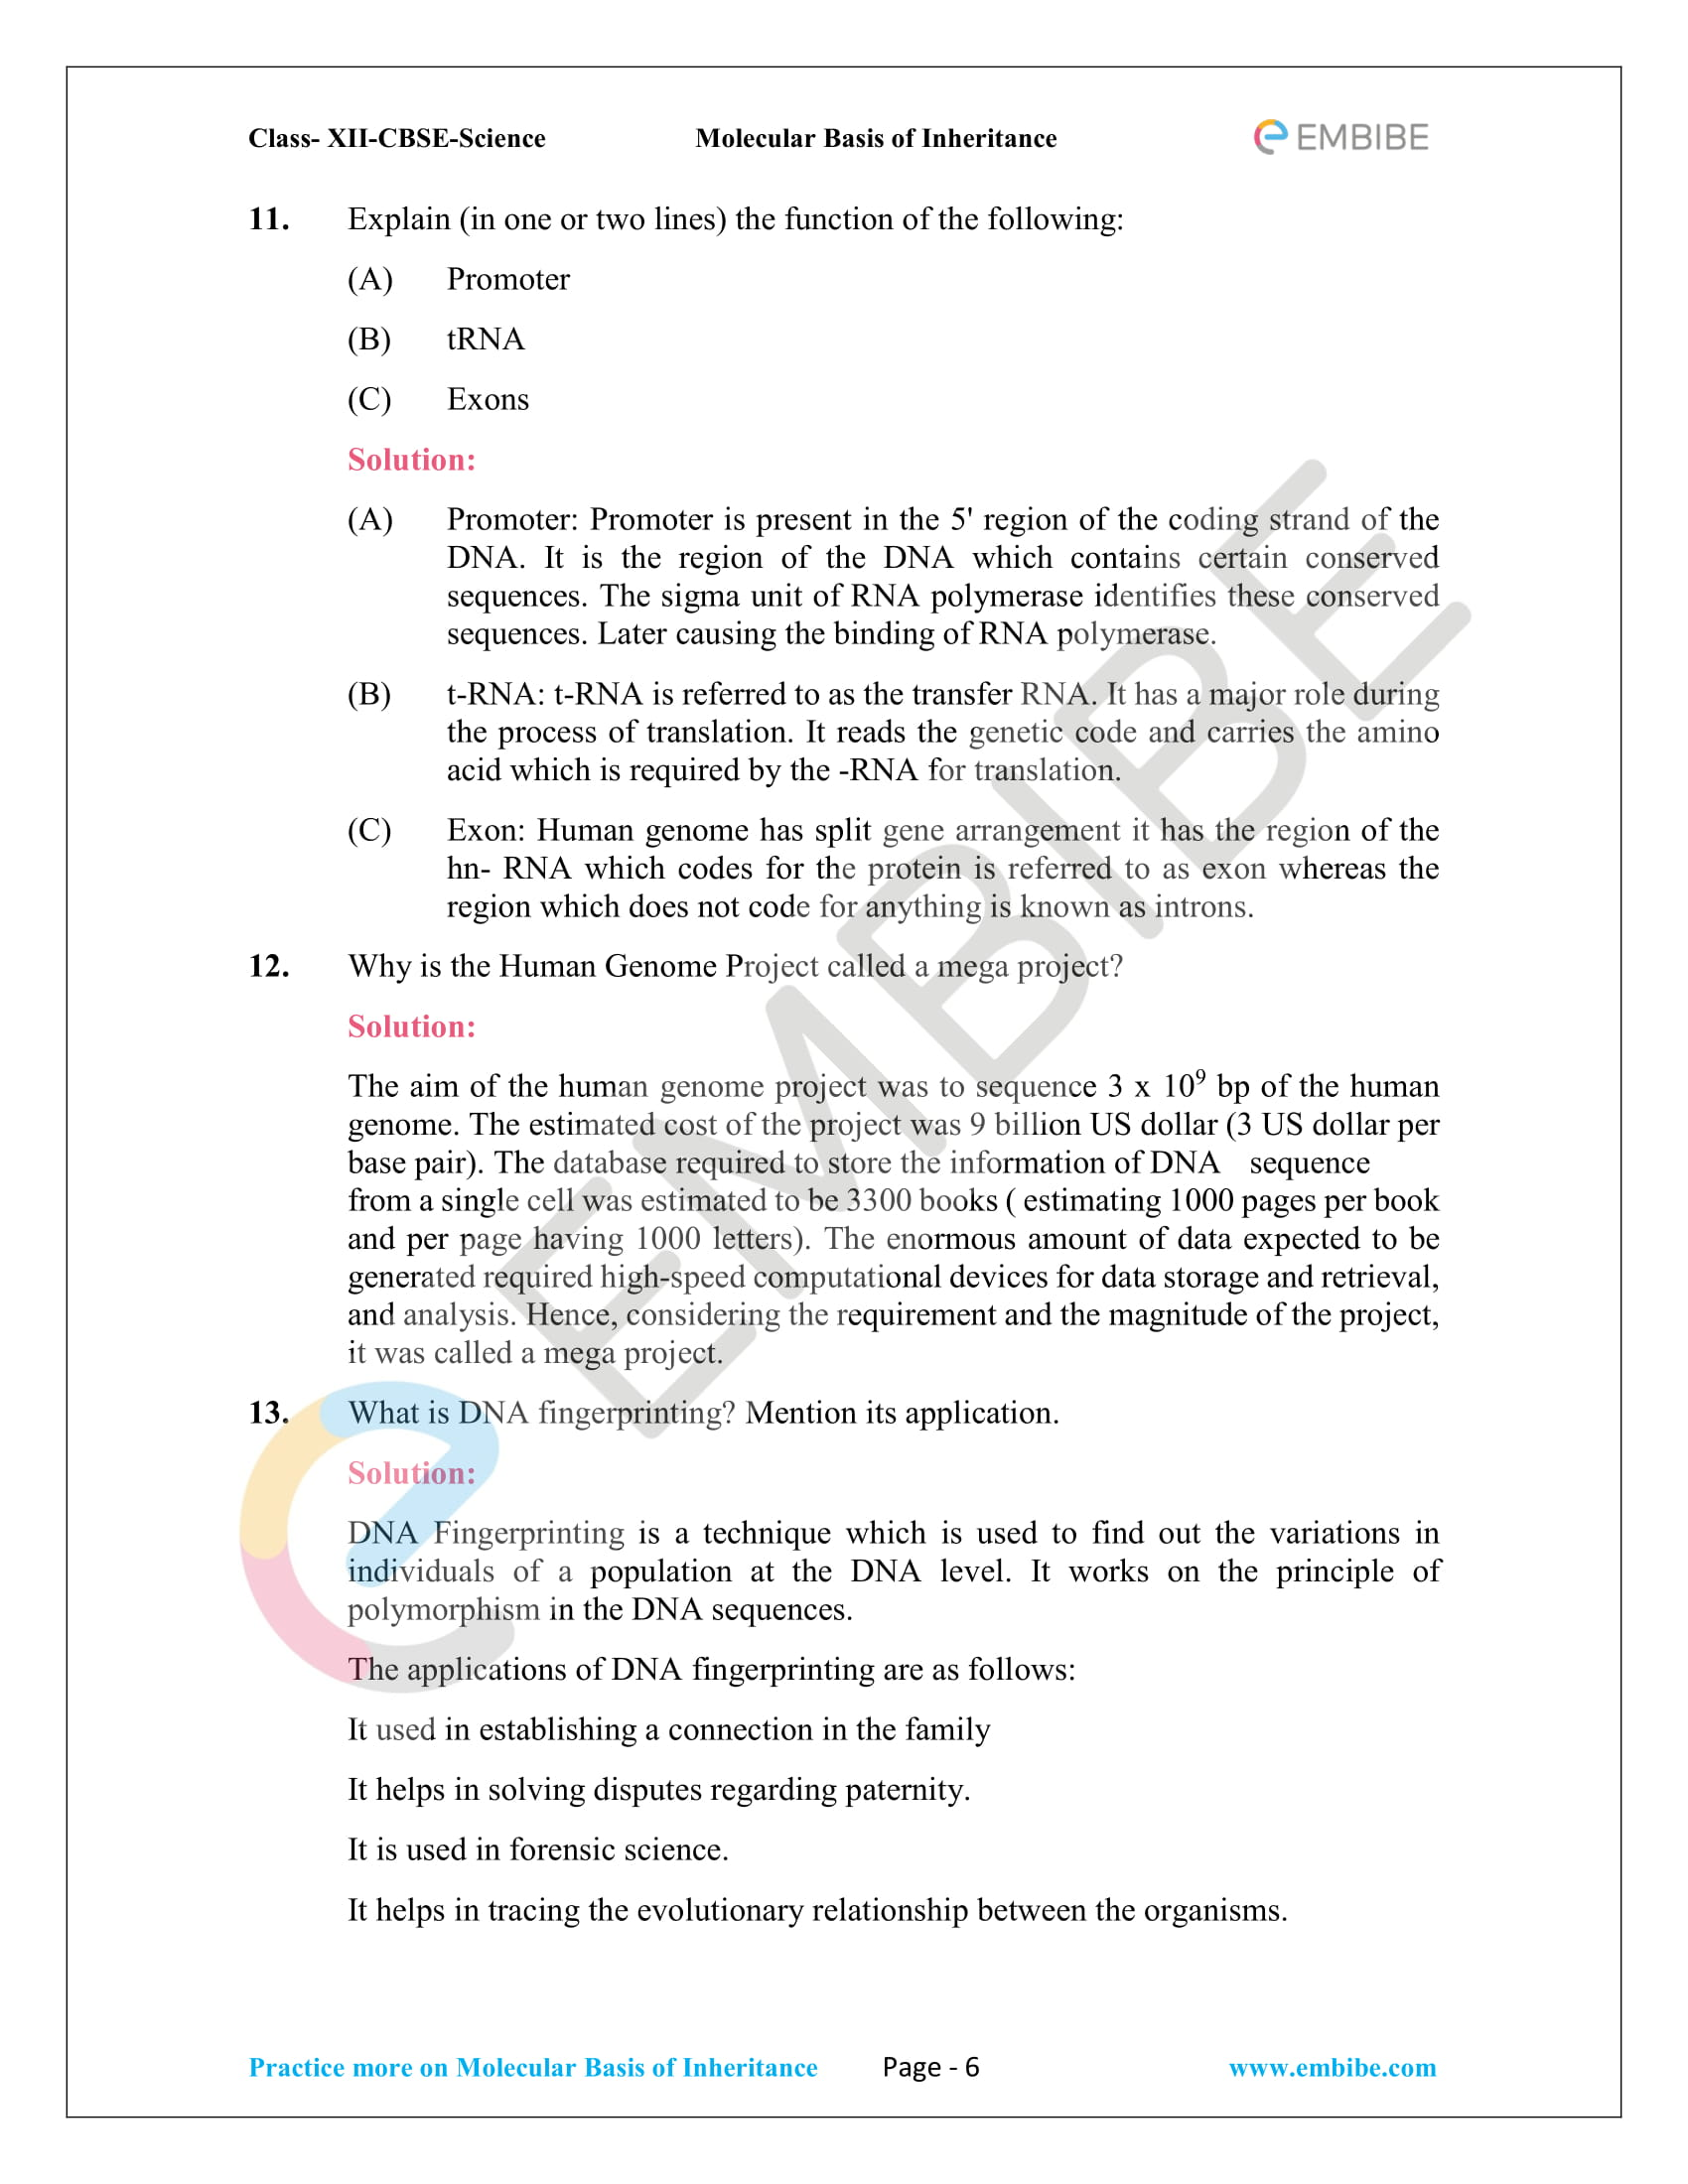 NCERT Solutions for Class 12 Biology Chapter 6: Molecular Basis Of Inheritance - 6